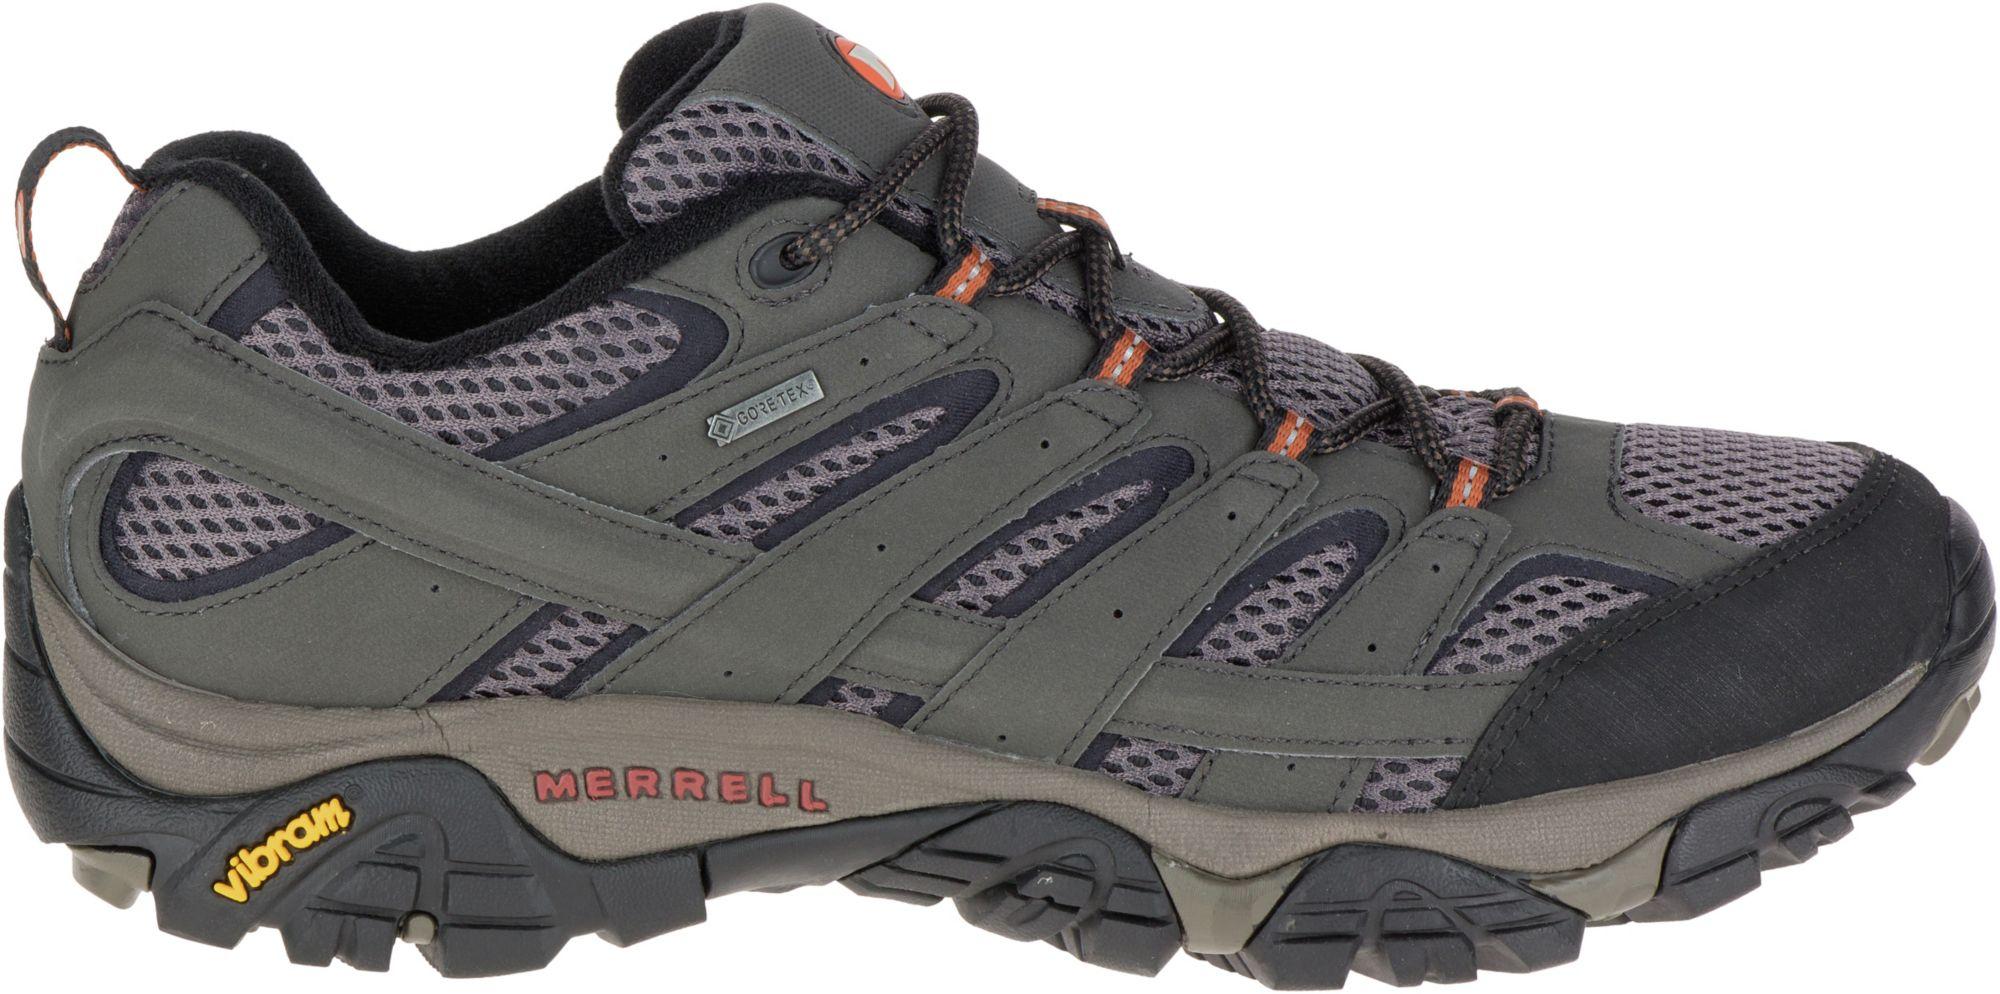 Merrell Men's Moab 2 GORE-TEX Hiking Shoes | DICK'S Sporting Goods